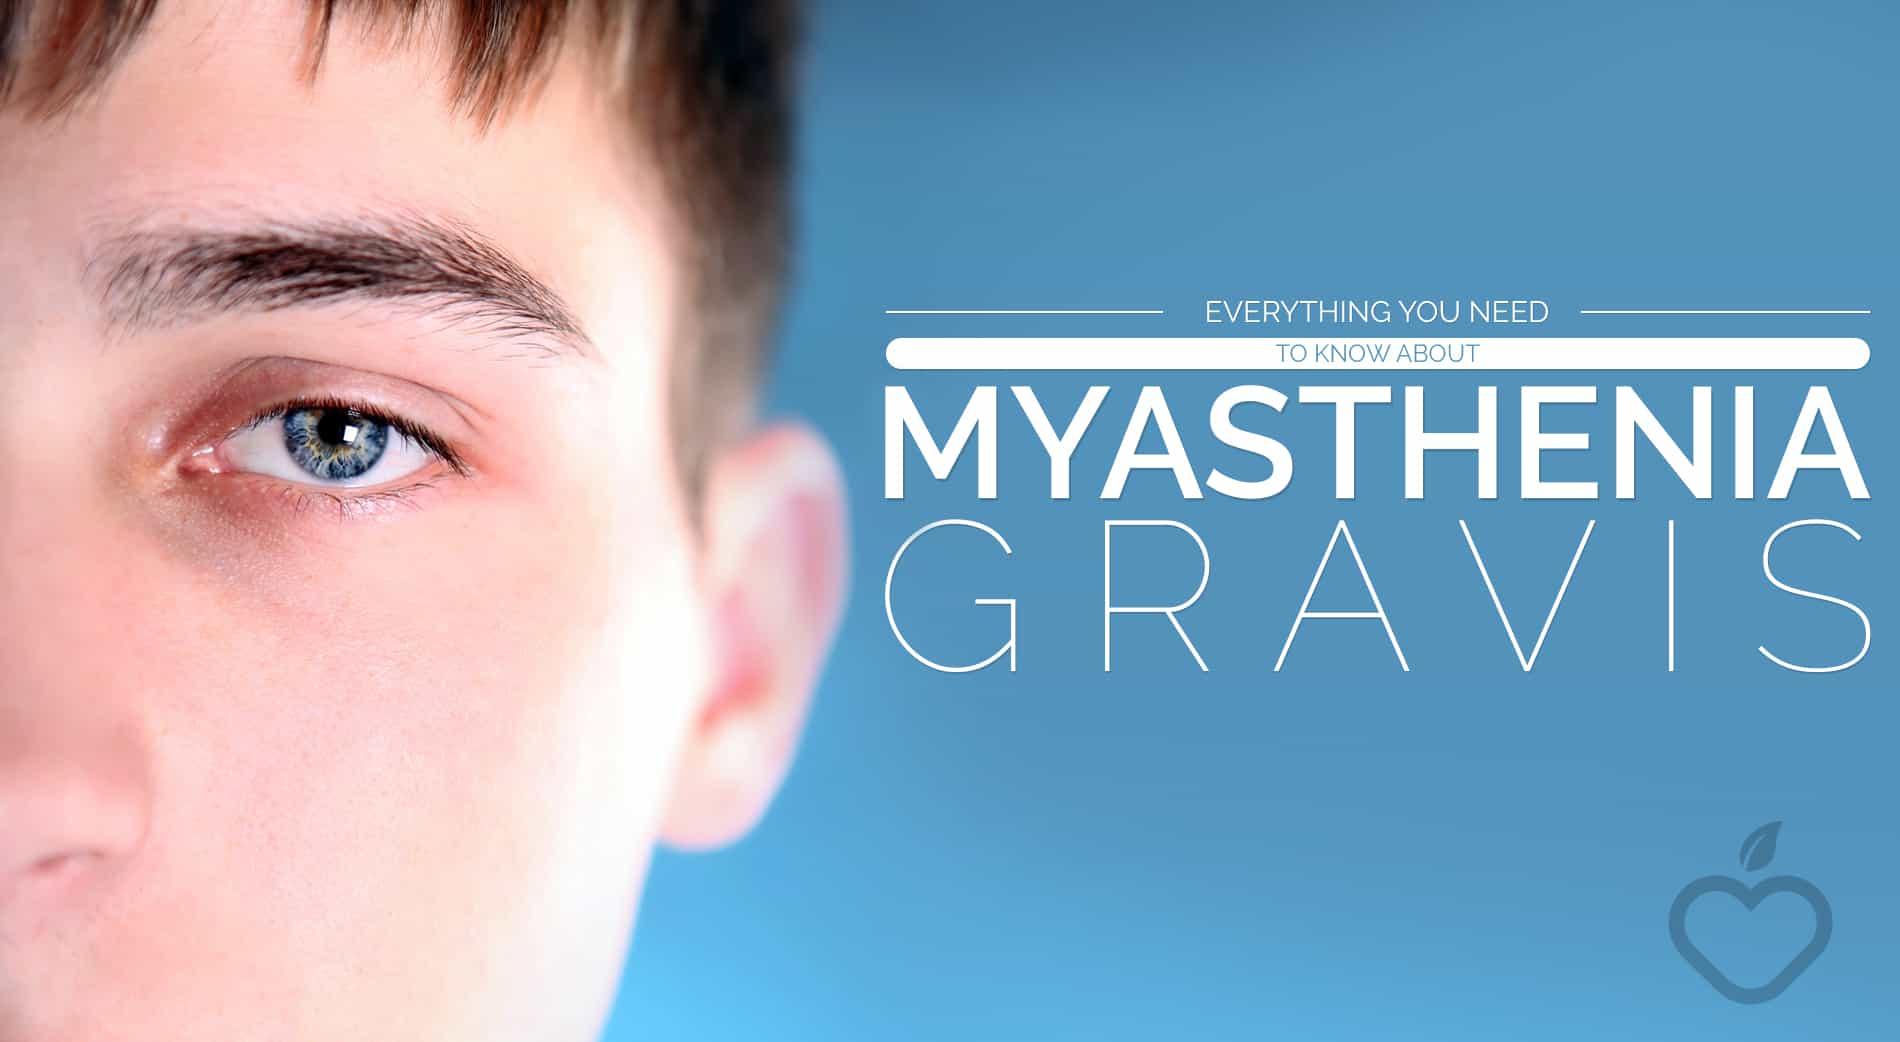 Myasthenie Gravis Image Design 1 1 - Every part You Want To Know About Myasthenia Gravis